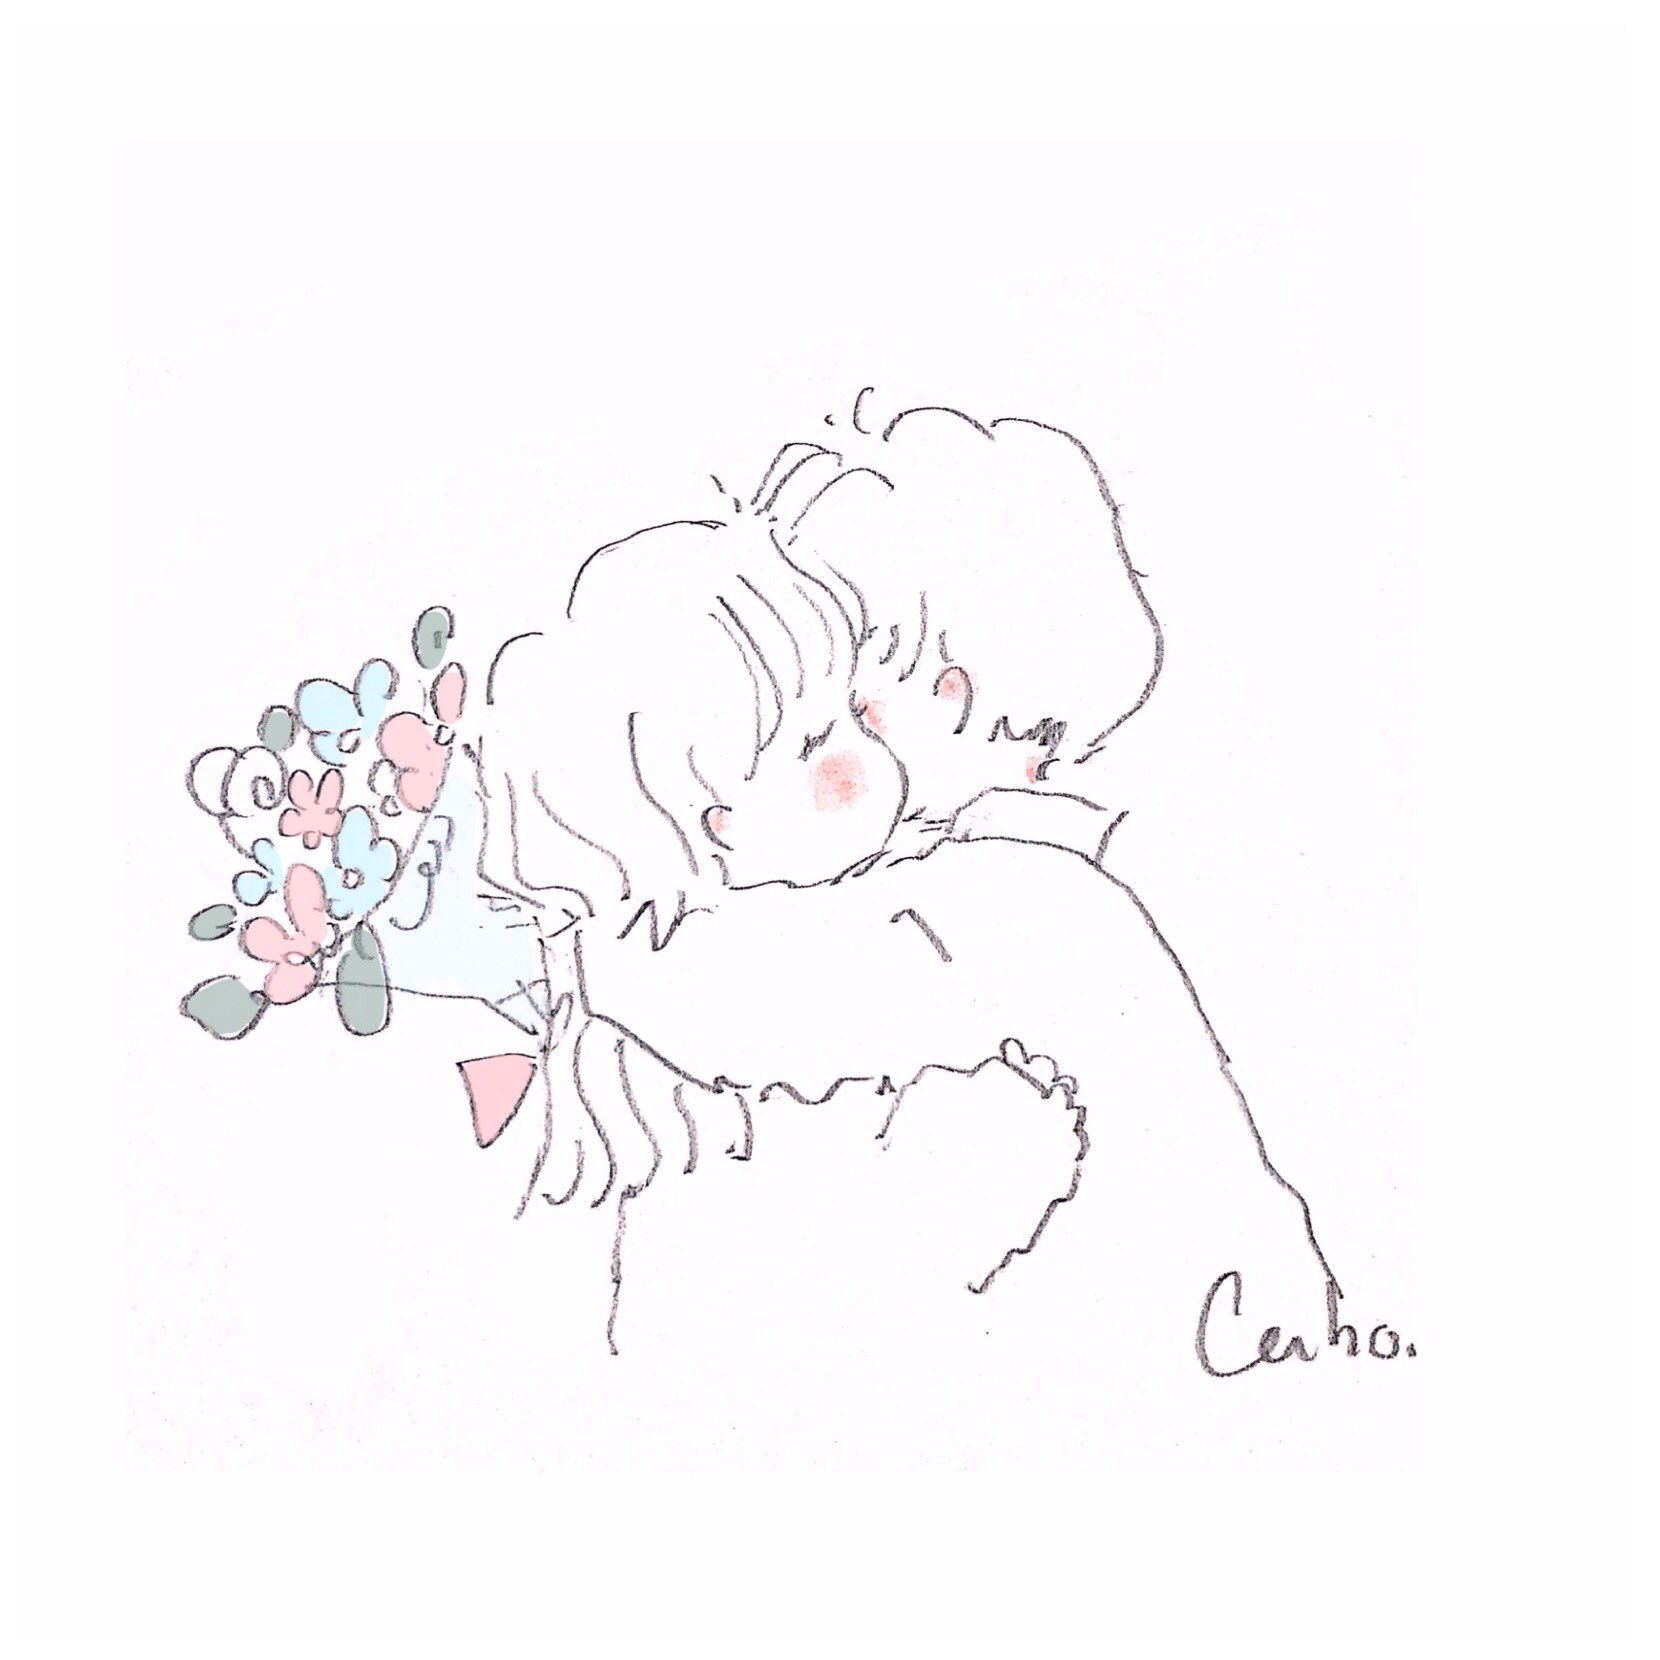 Anime おしゃれまとめの人気アイデア Pinterest Issathe Cherries Caho イラスト キュートなスケッチ デッサン カップル